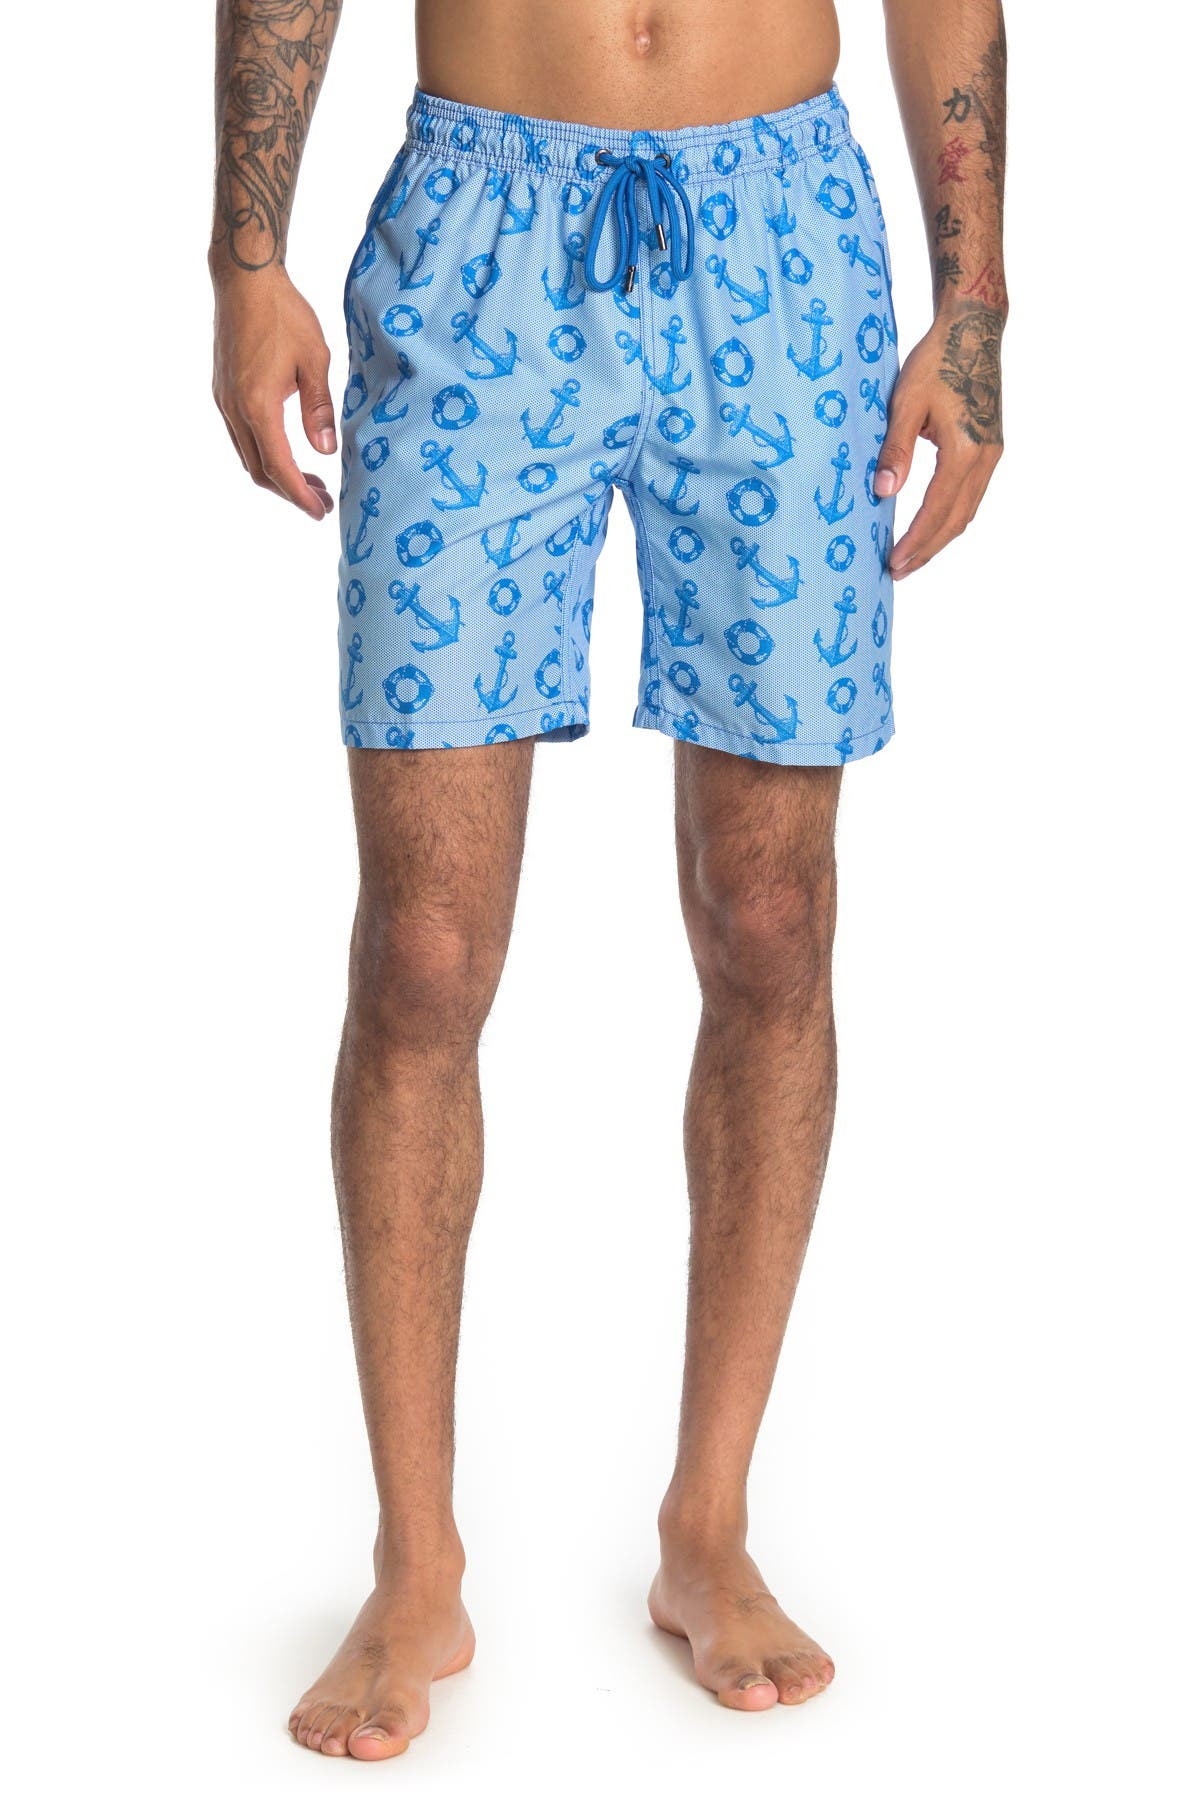 Image of Mr. Swim Anchor Printed Swimming Trunks